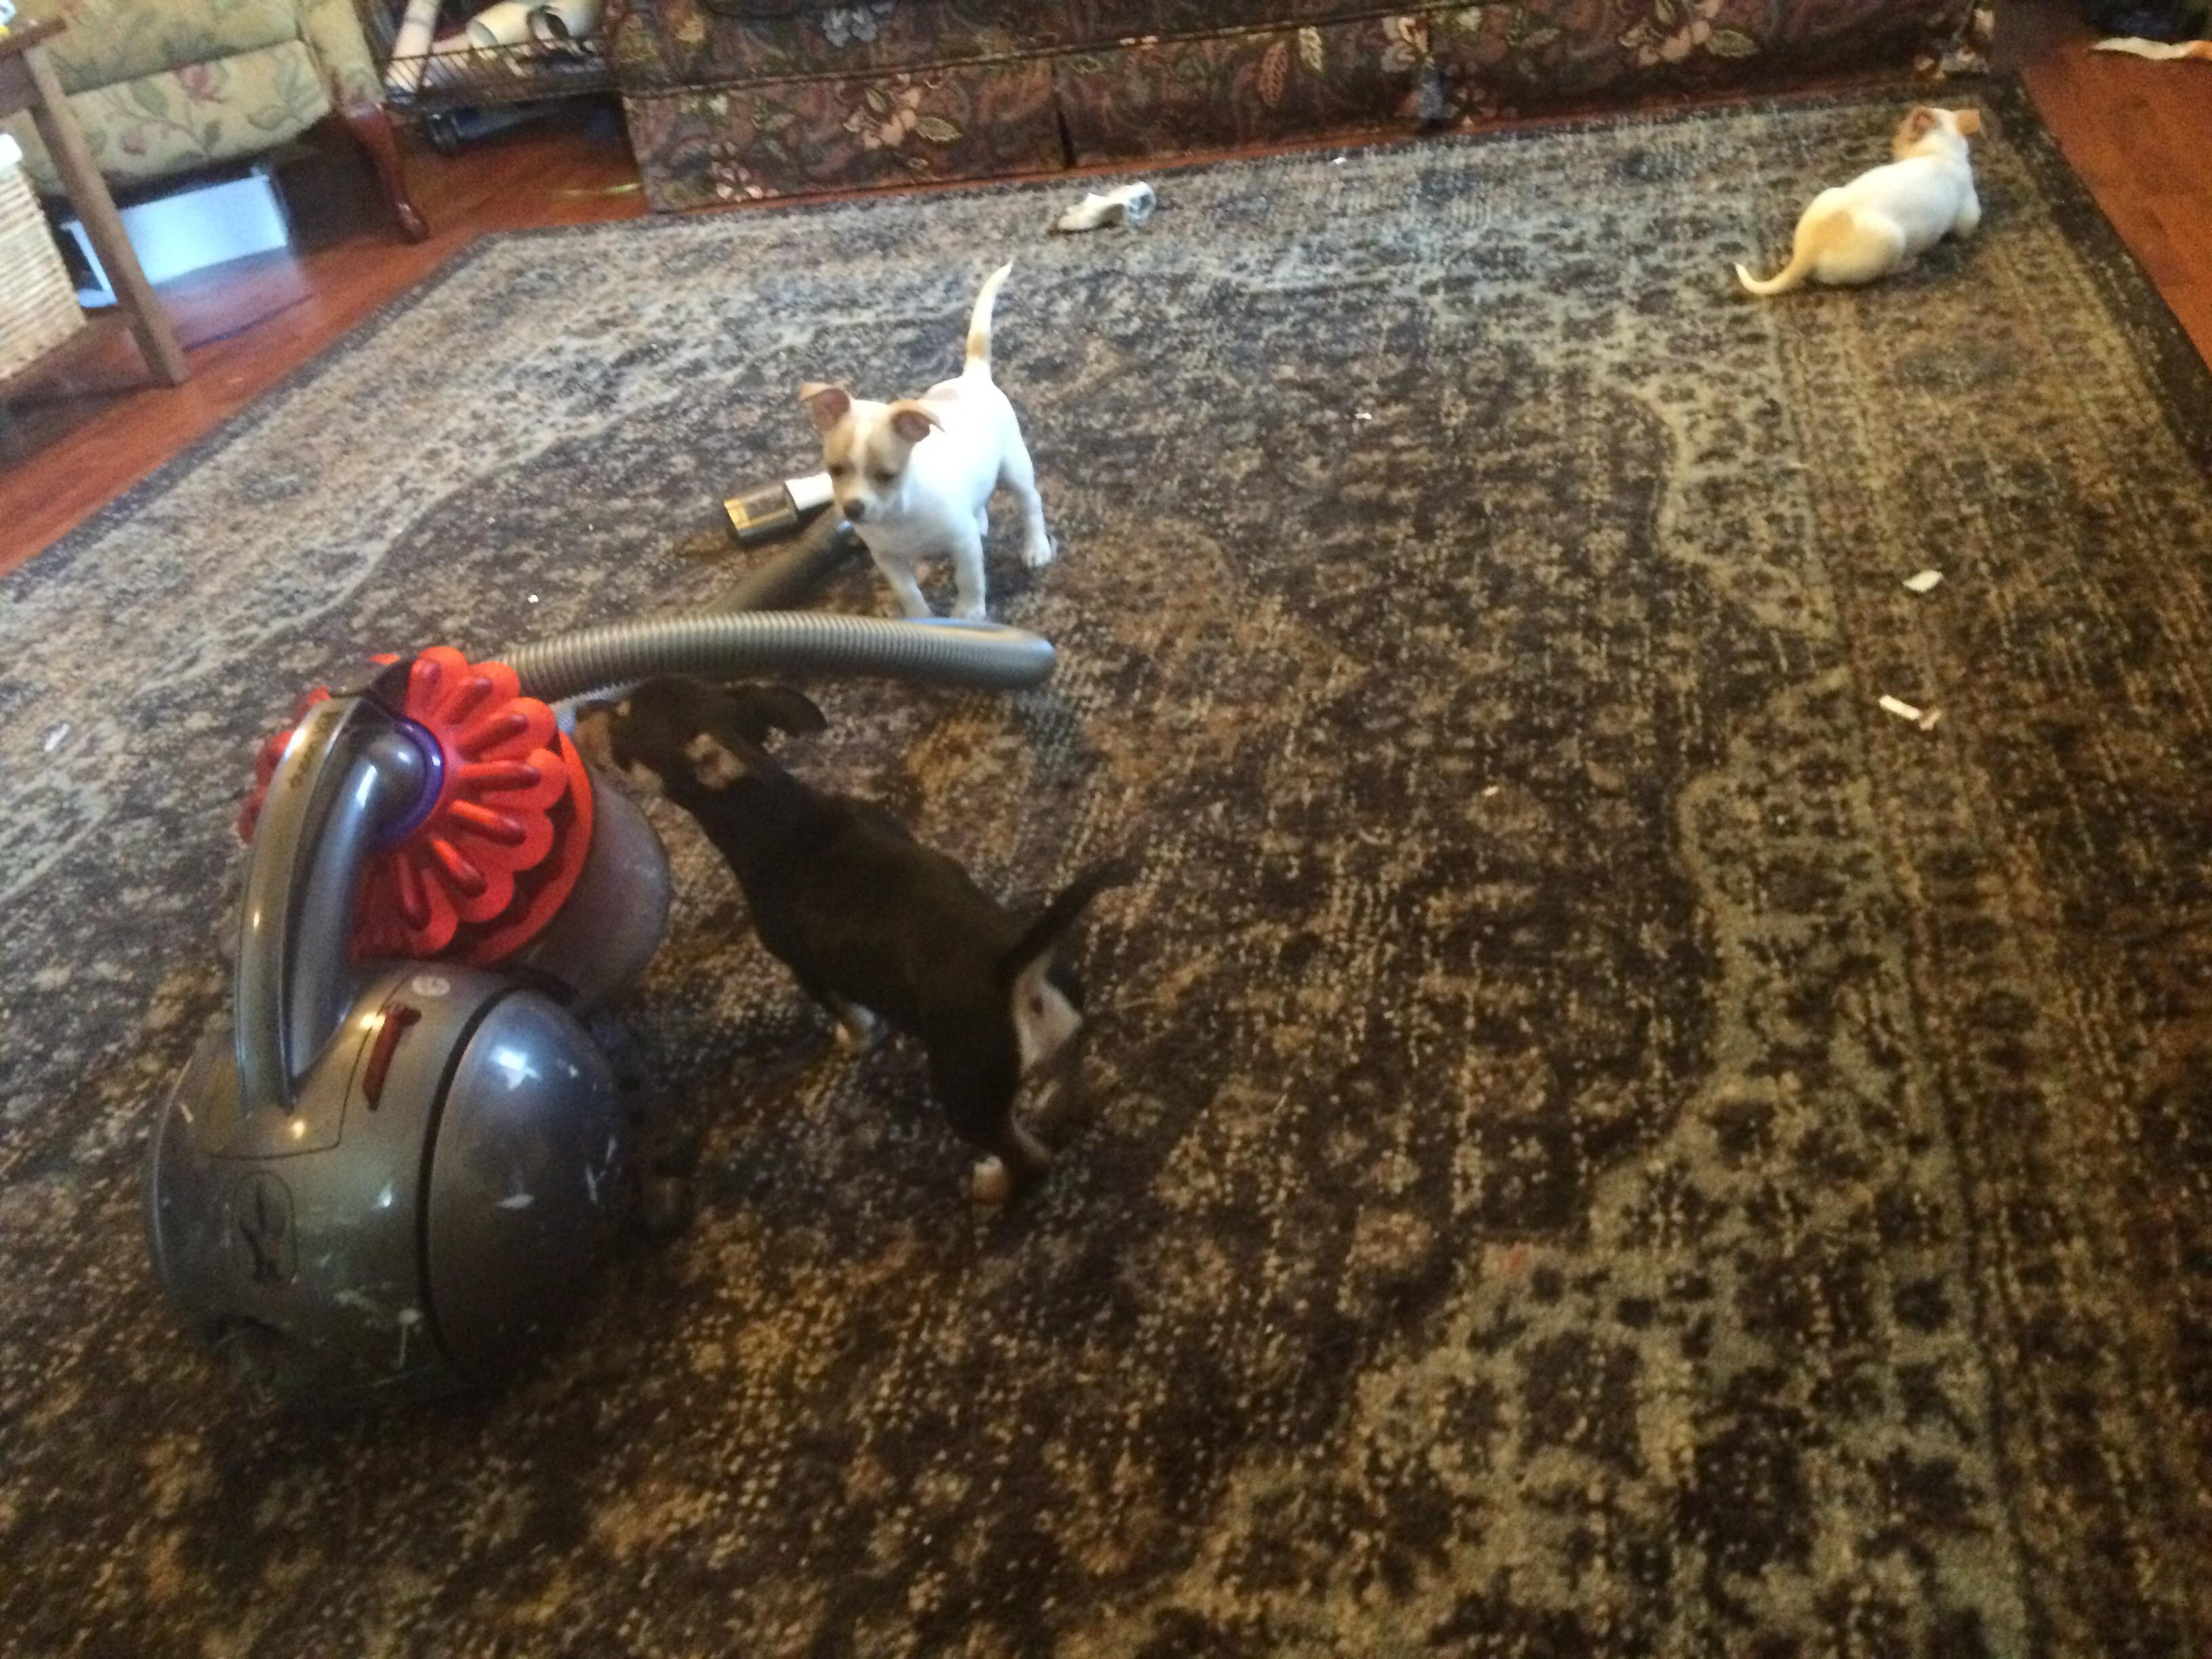 The Potty Gang: Vacuum Training 101